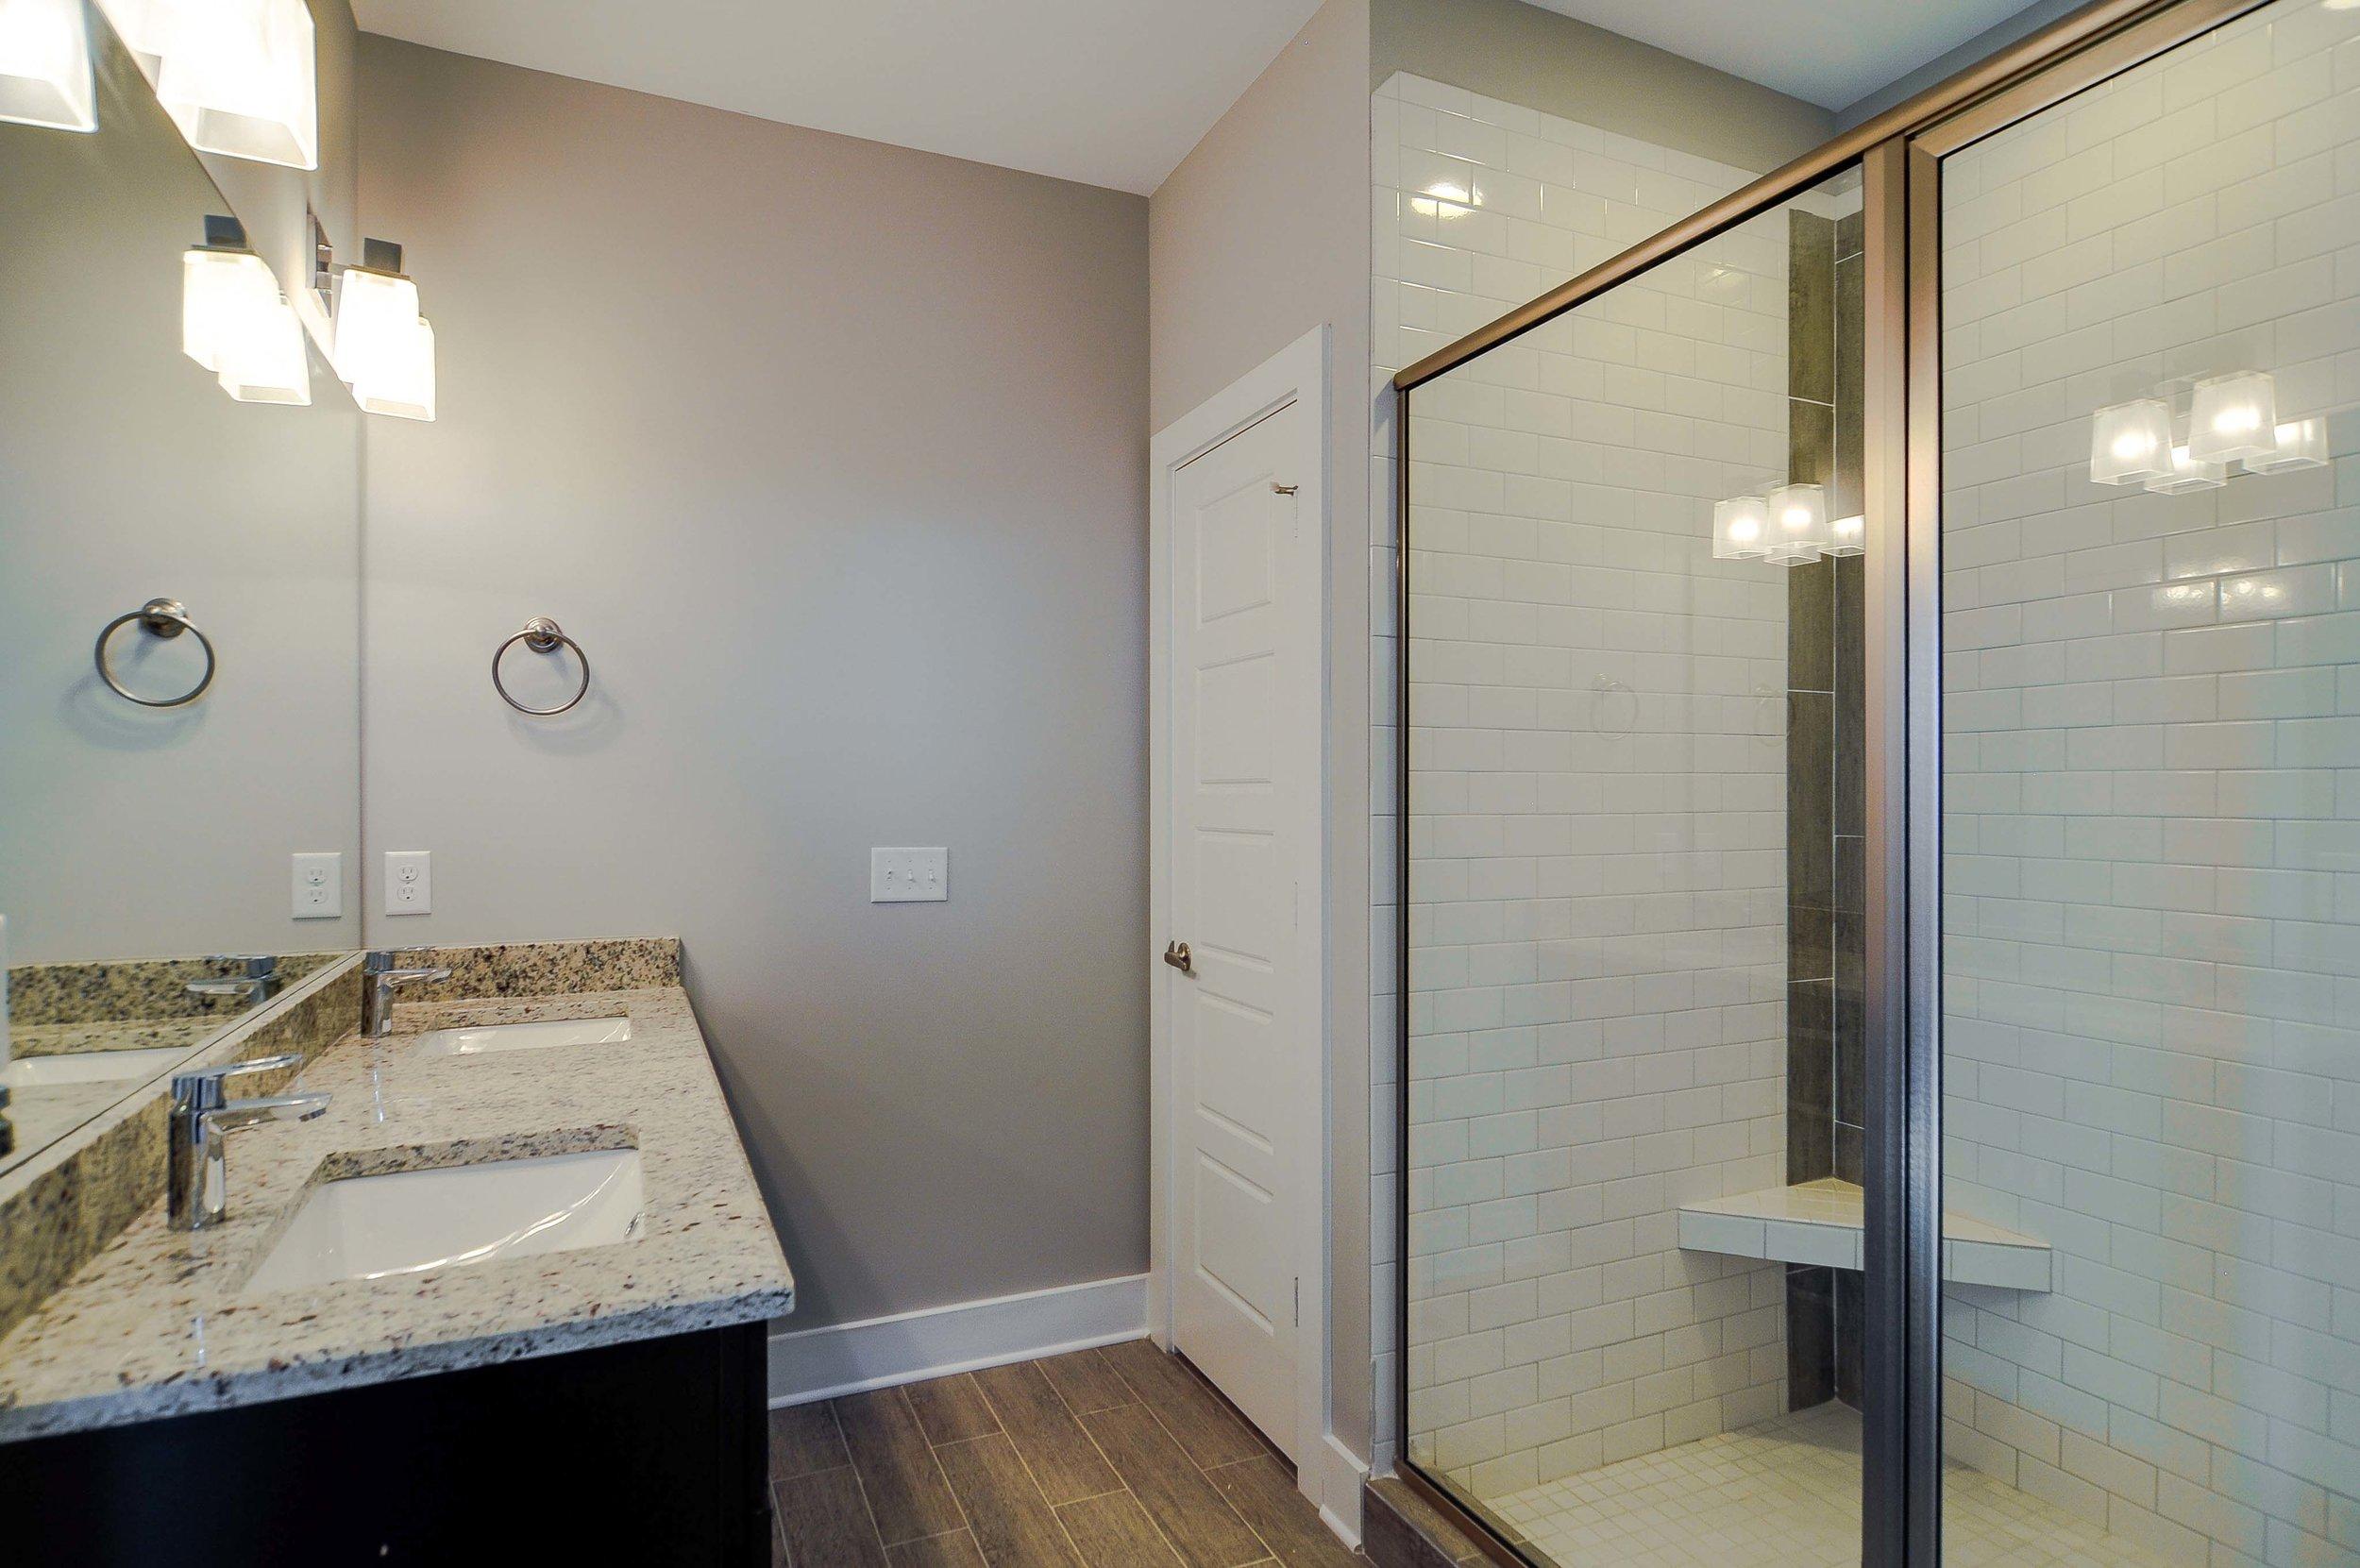 House-Plans-Online-Nashville-Narrow-Master Bath-Kentucky.jpg